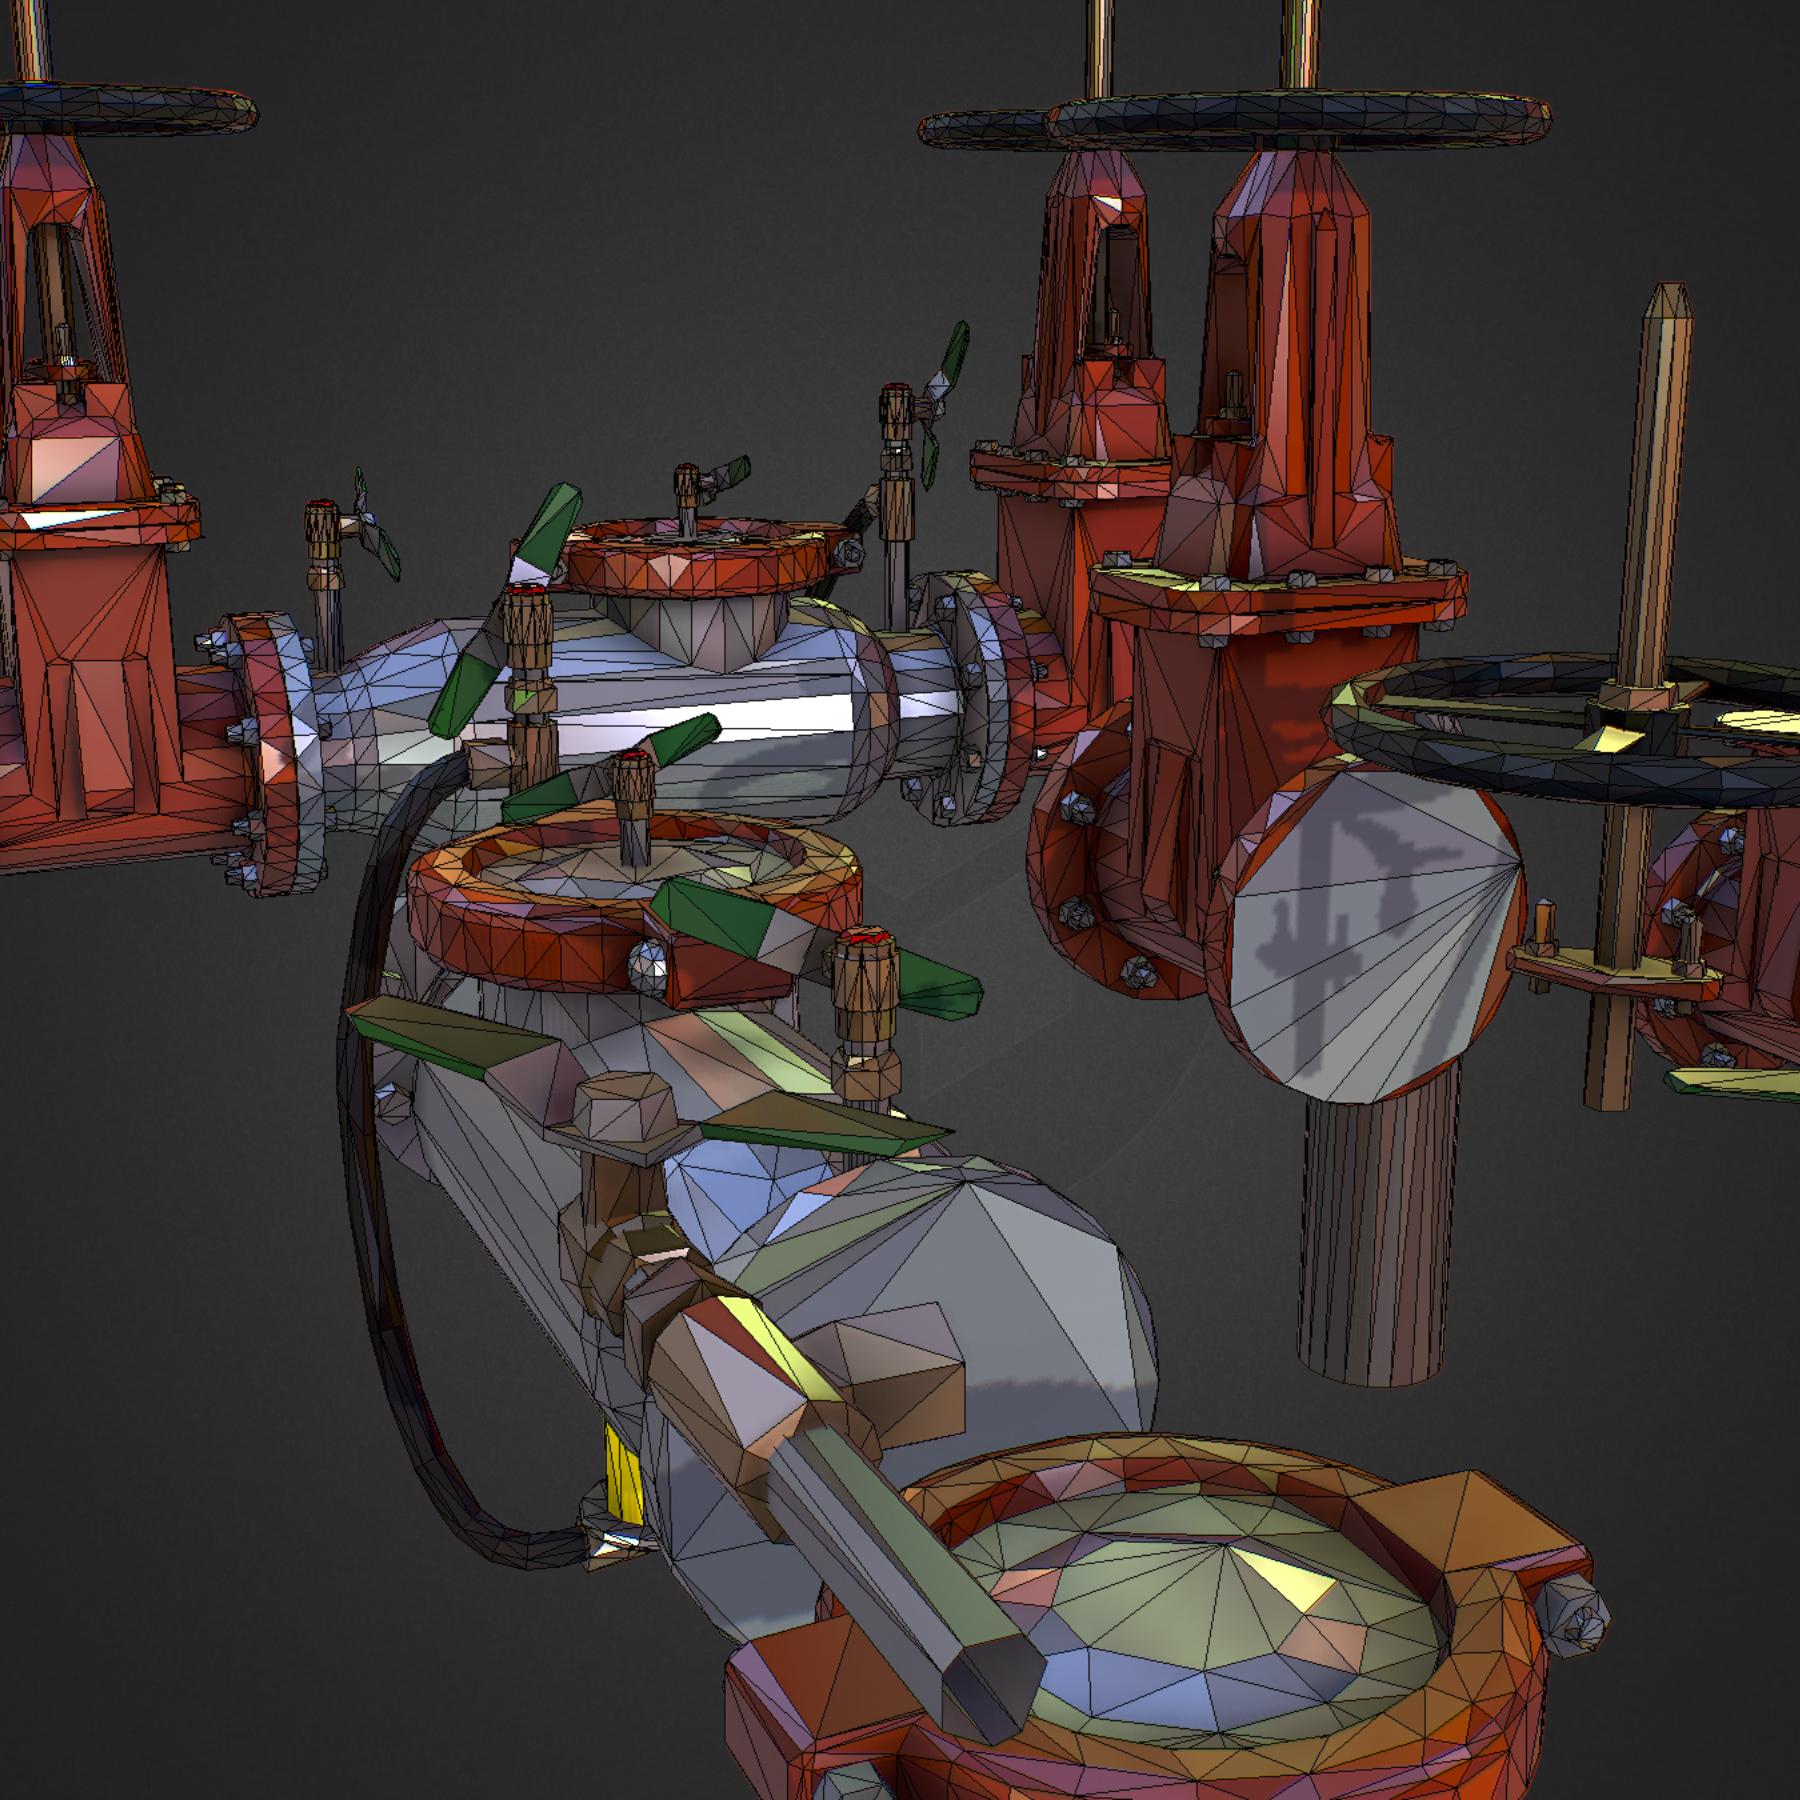 Low Poly ART Backflow Water Pipe Constructor 3d model max 3ds max plugin fbx ma mb tga targa icb vda vst pix obj 272584